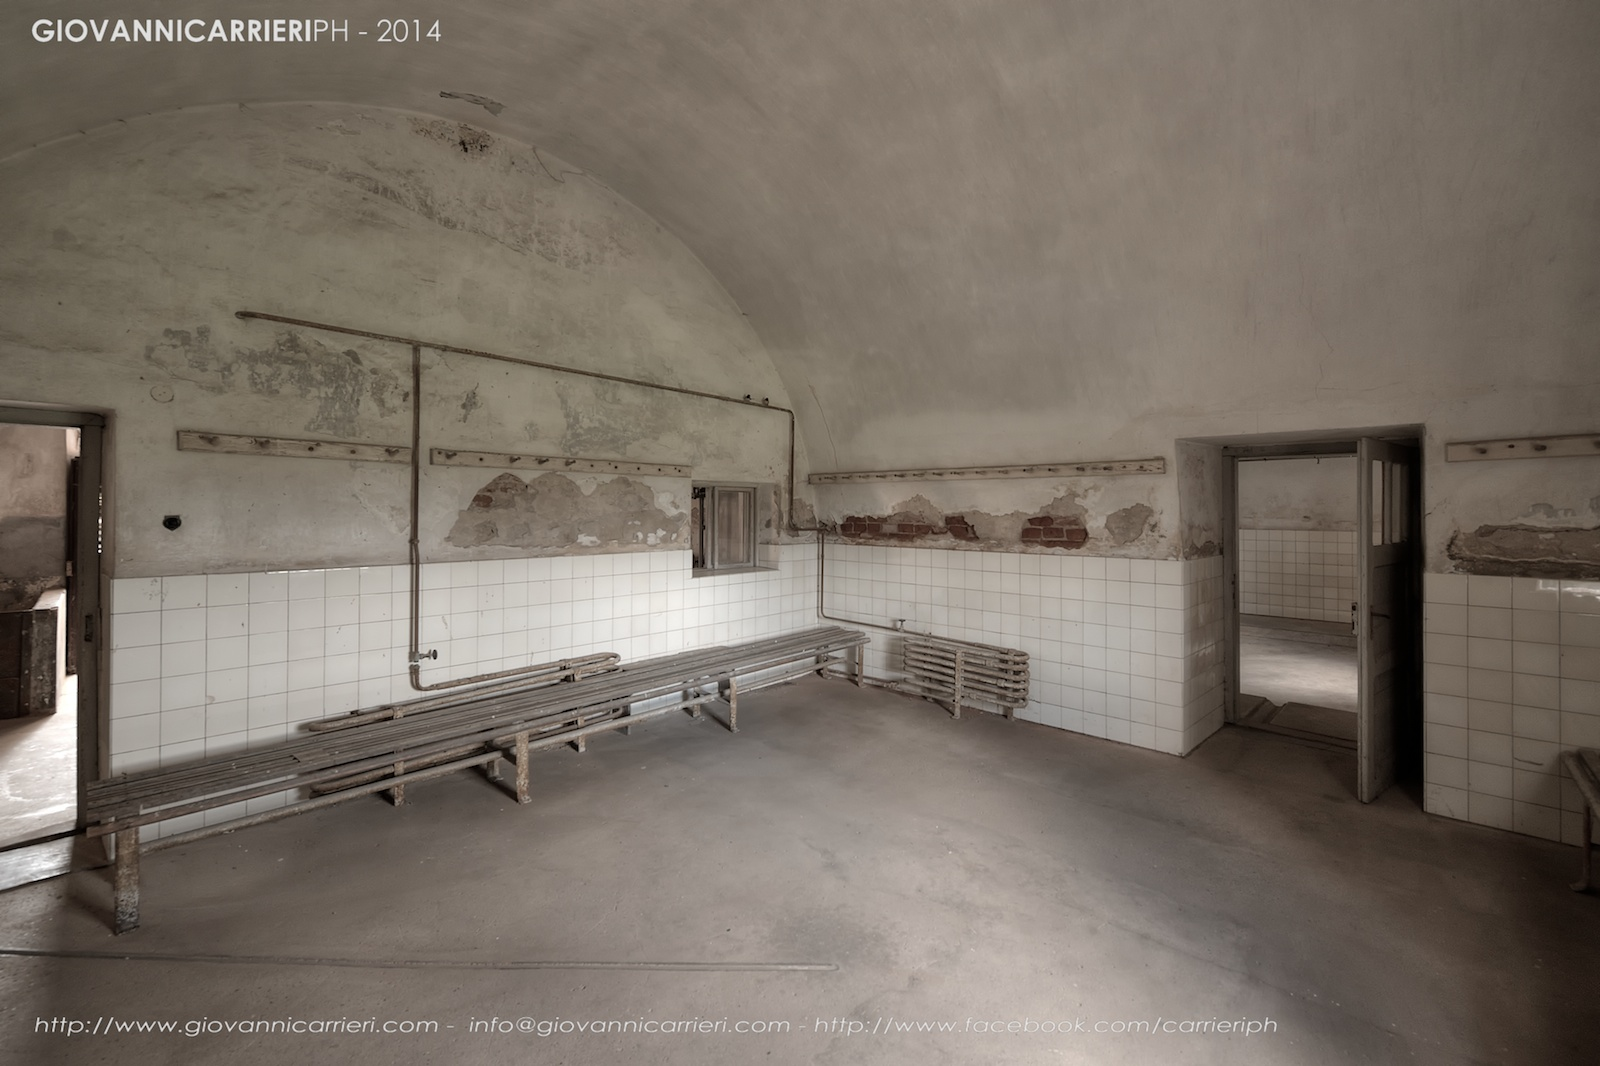 Lo spogliatoio - Theresienstadt